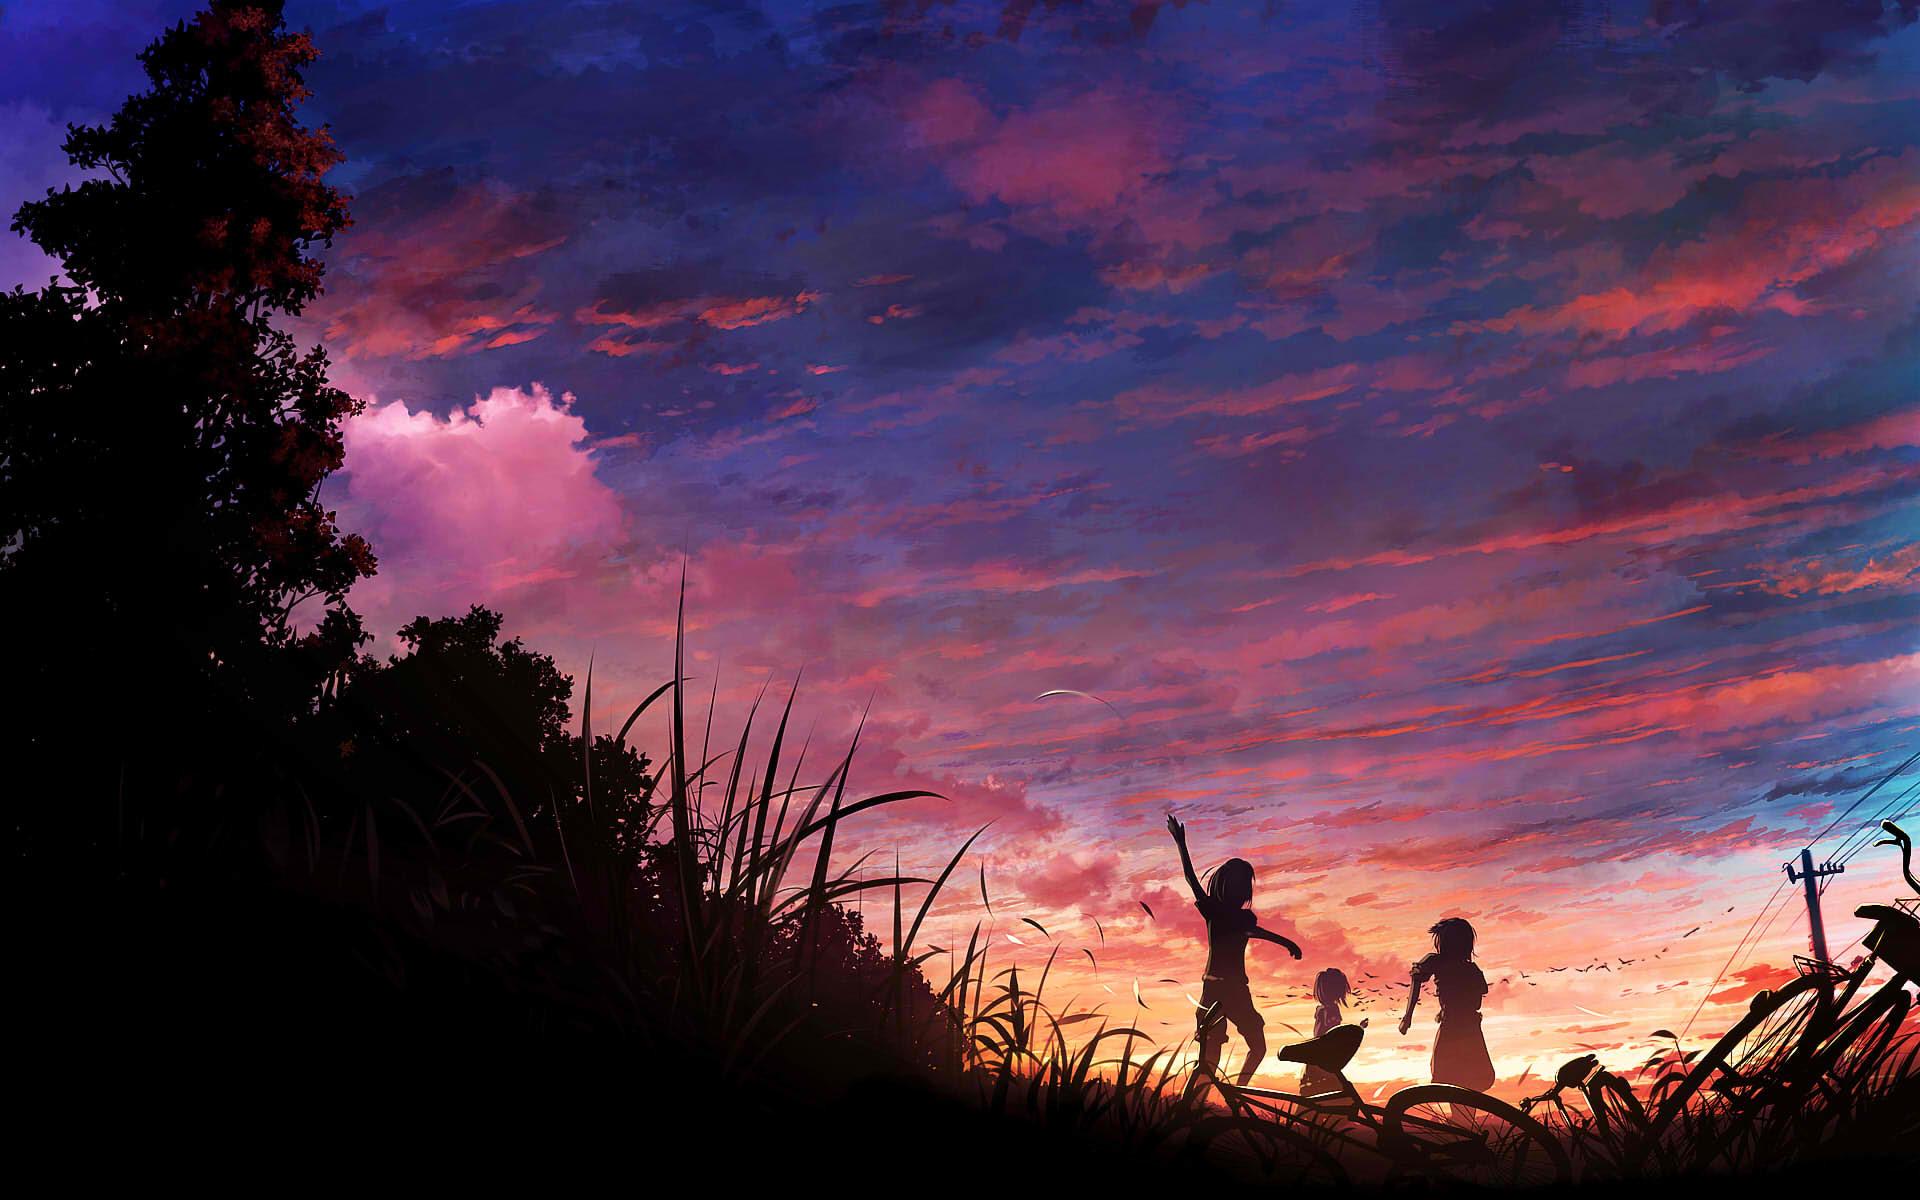 Childrens Playing Sunset Scene